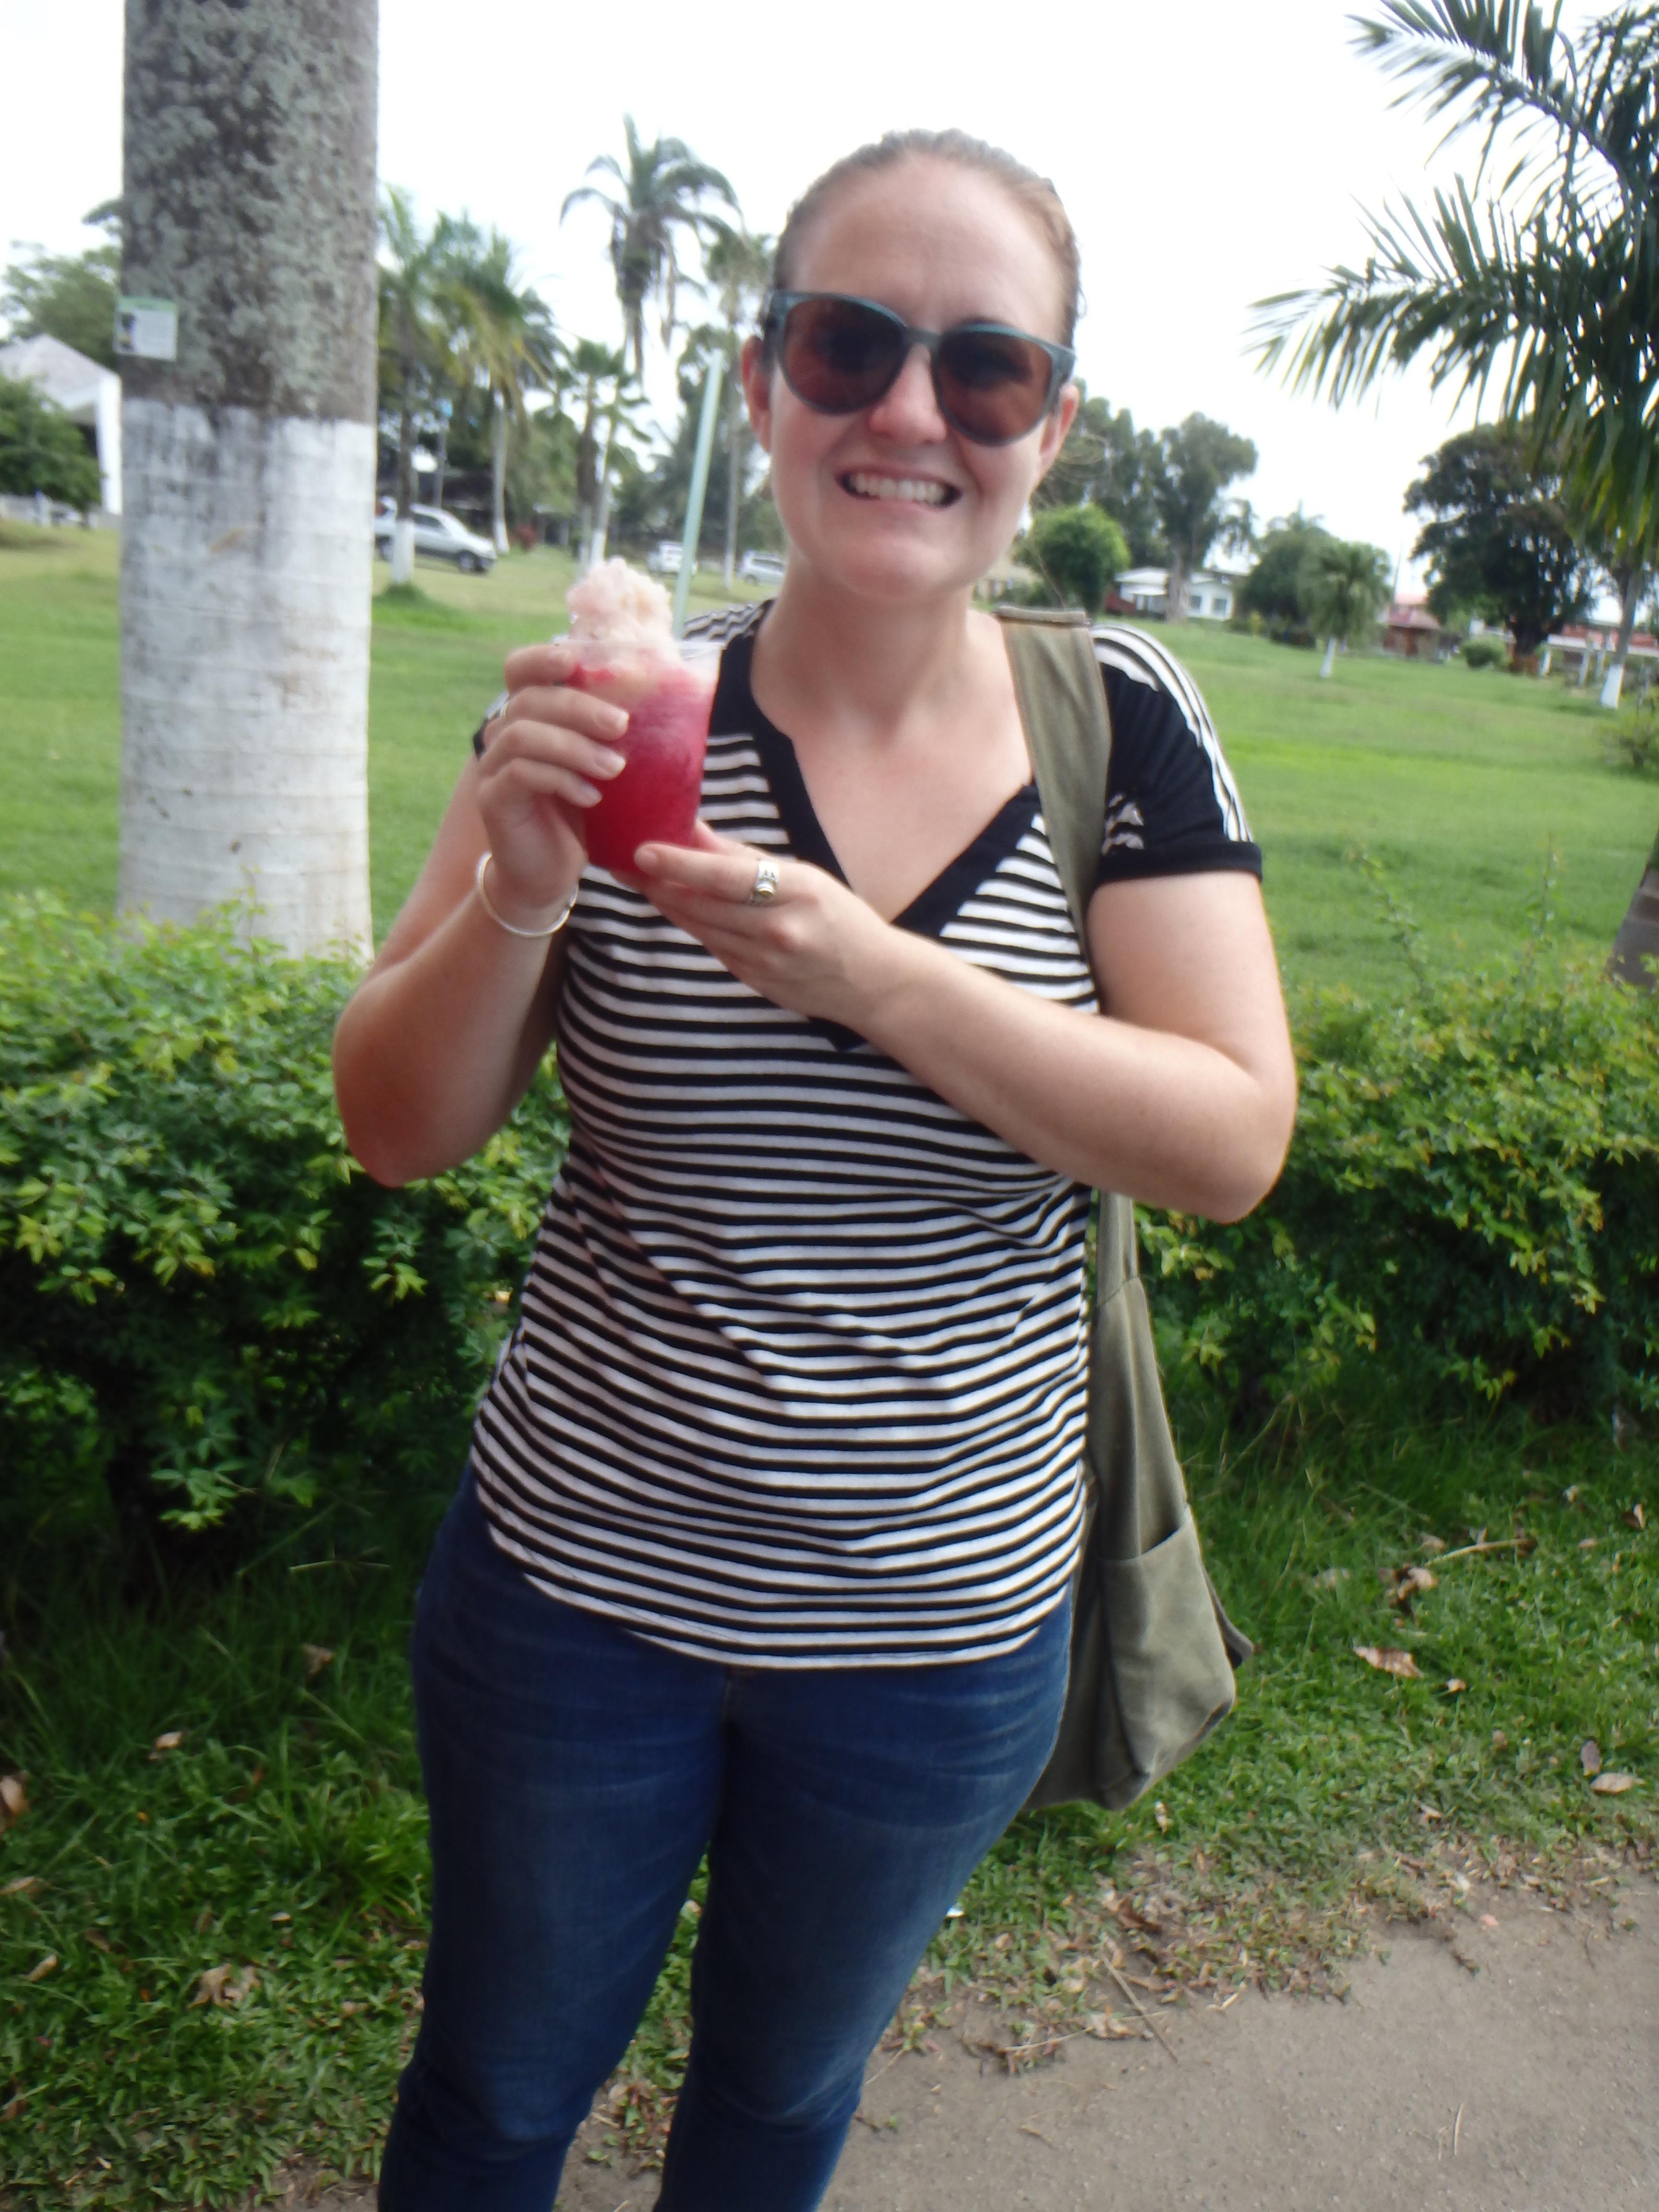 Guyana botanical gardens and Guyana zoo Guyanese traditional food